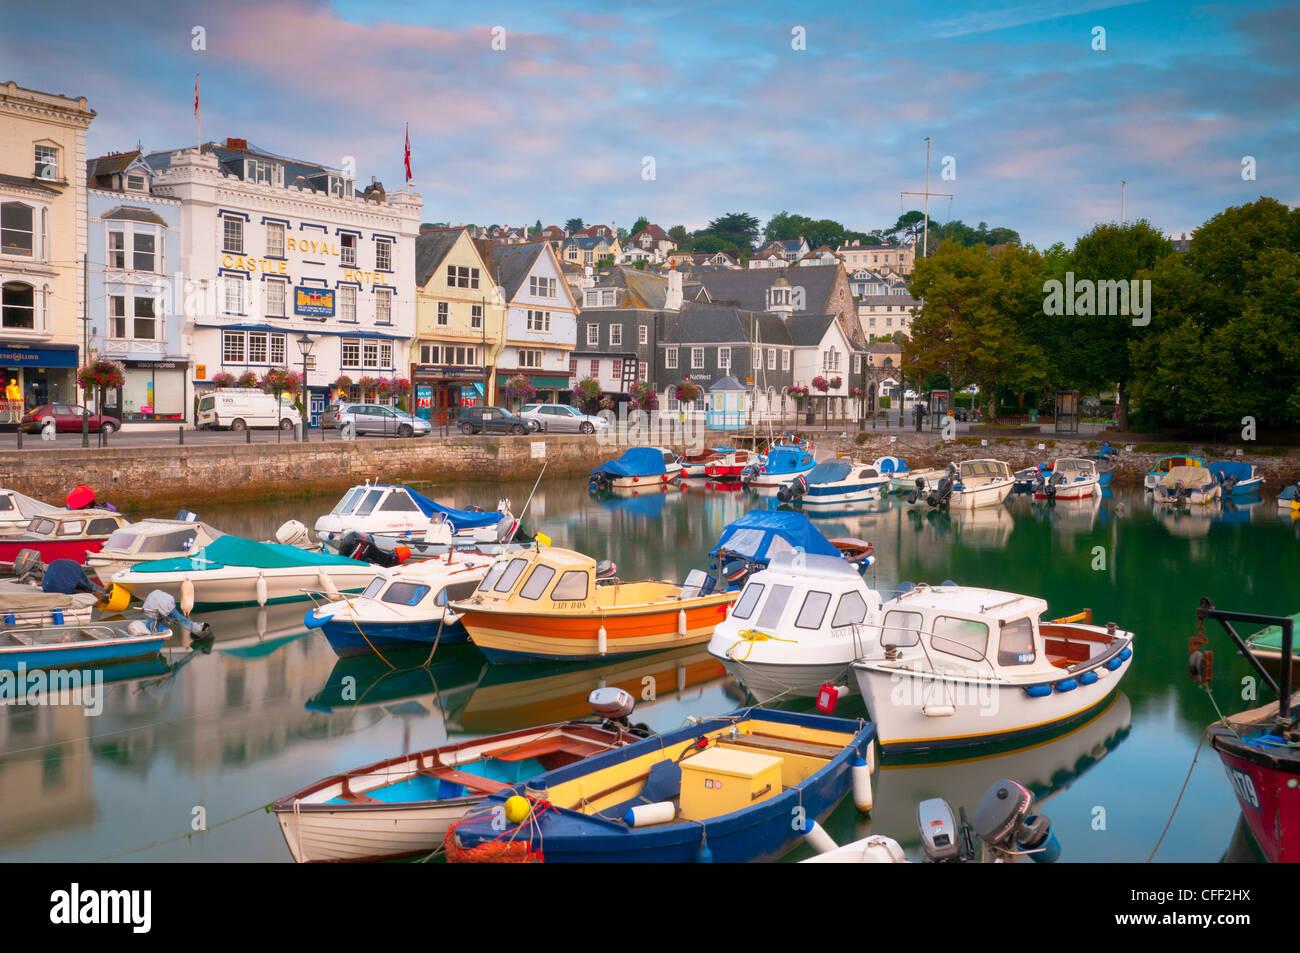 The Quay, Dartmouth, Devon, England, United Kingdom, Europe - Stock Image